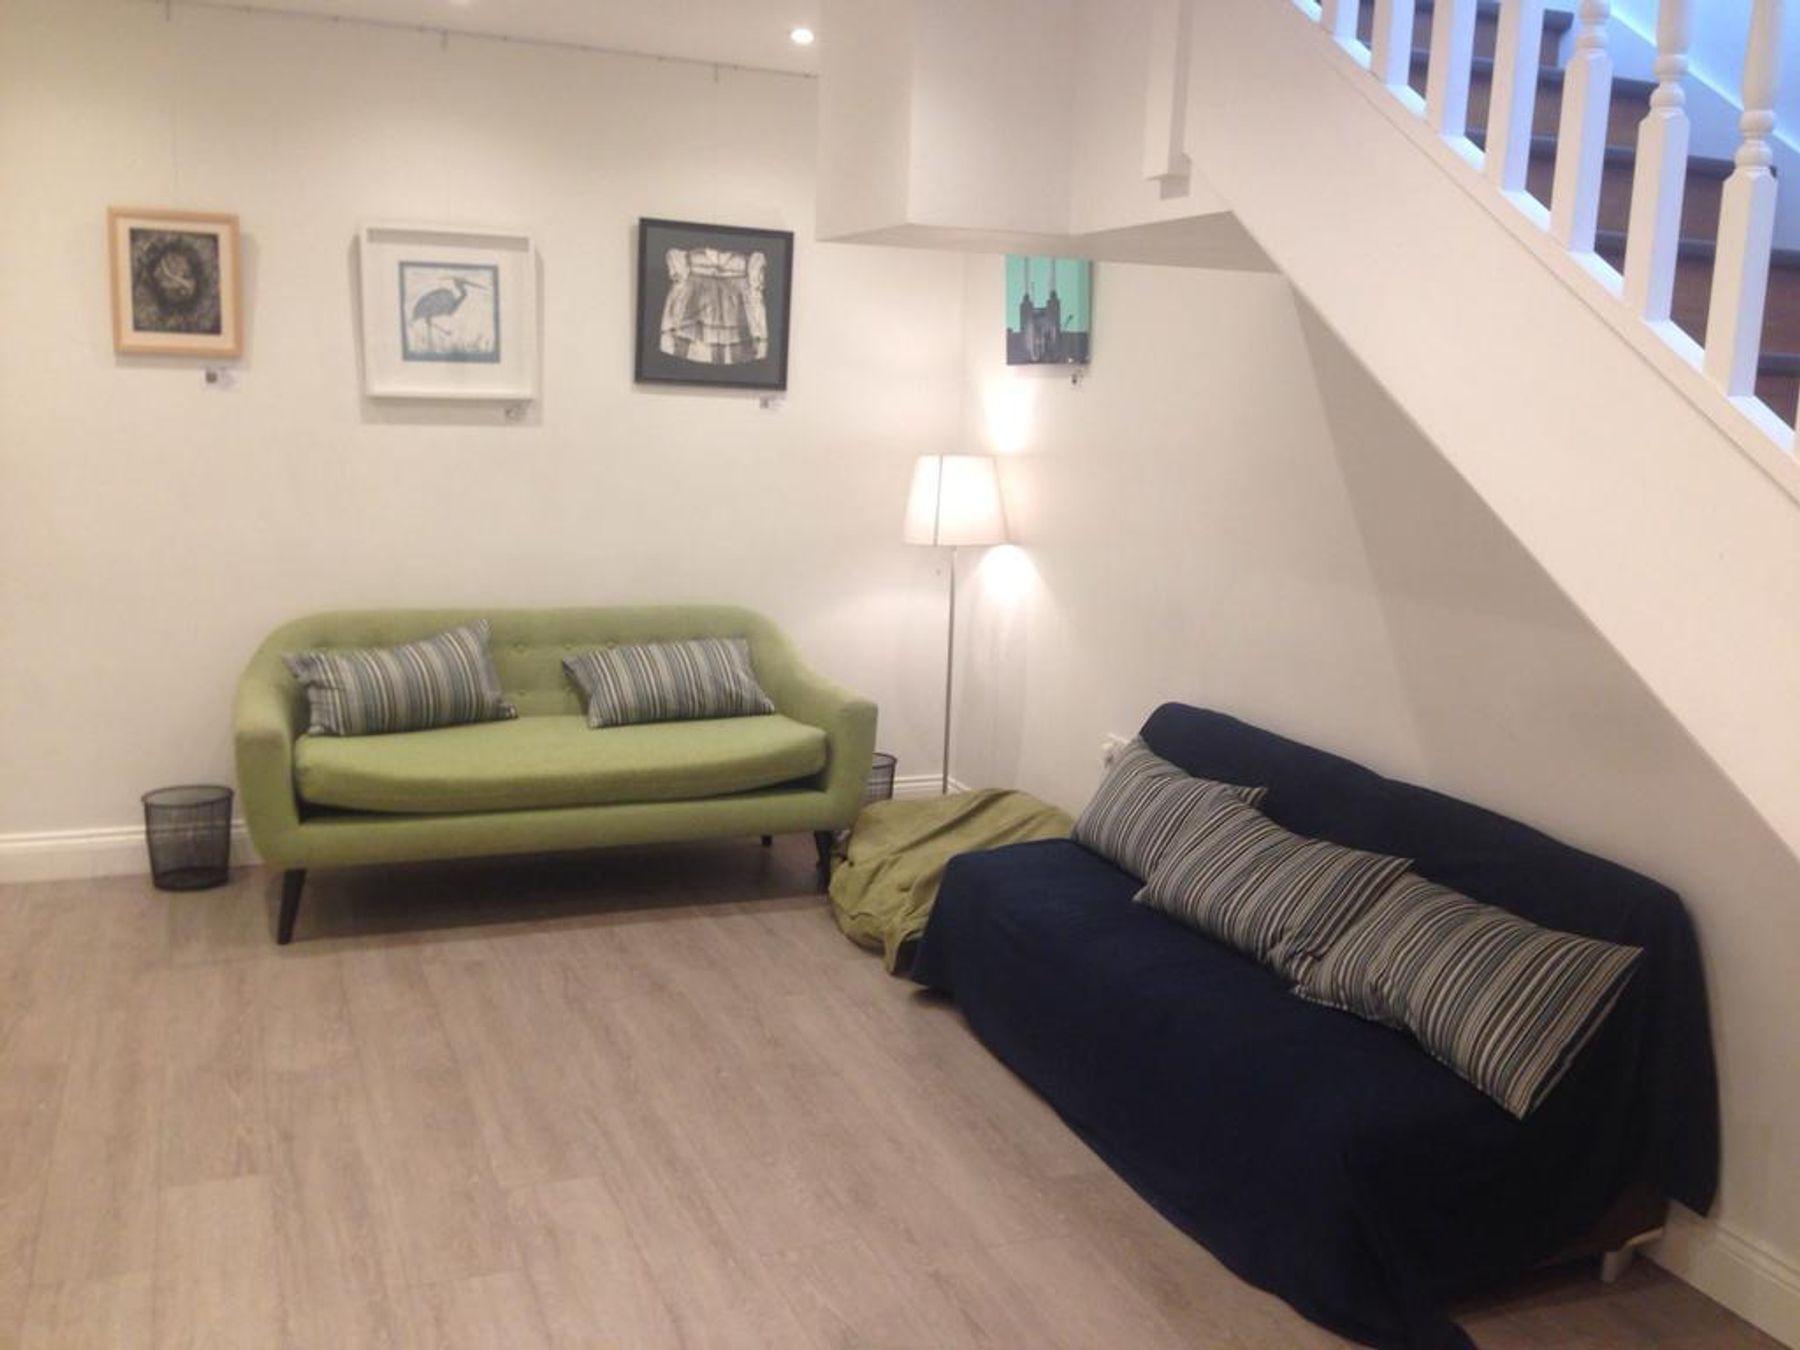 The Living Room Place Furzedown Venue